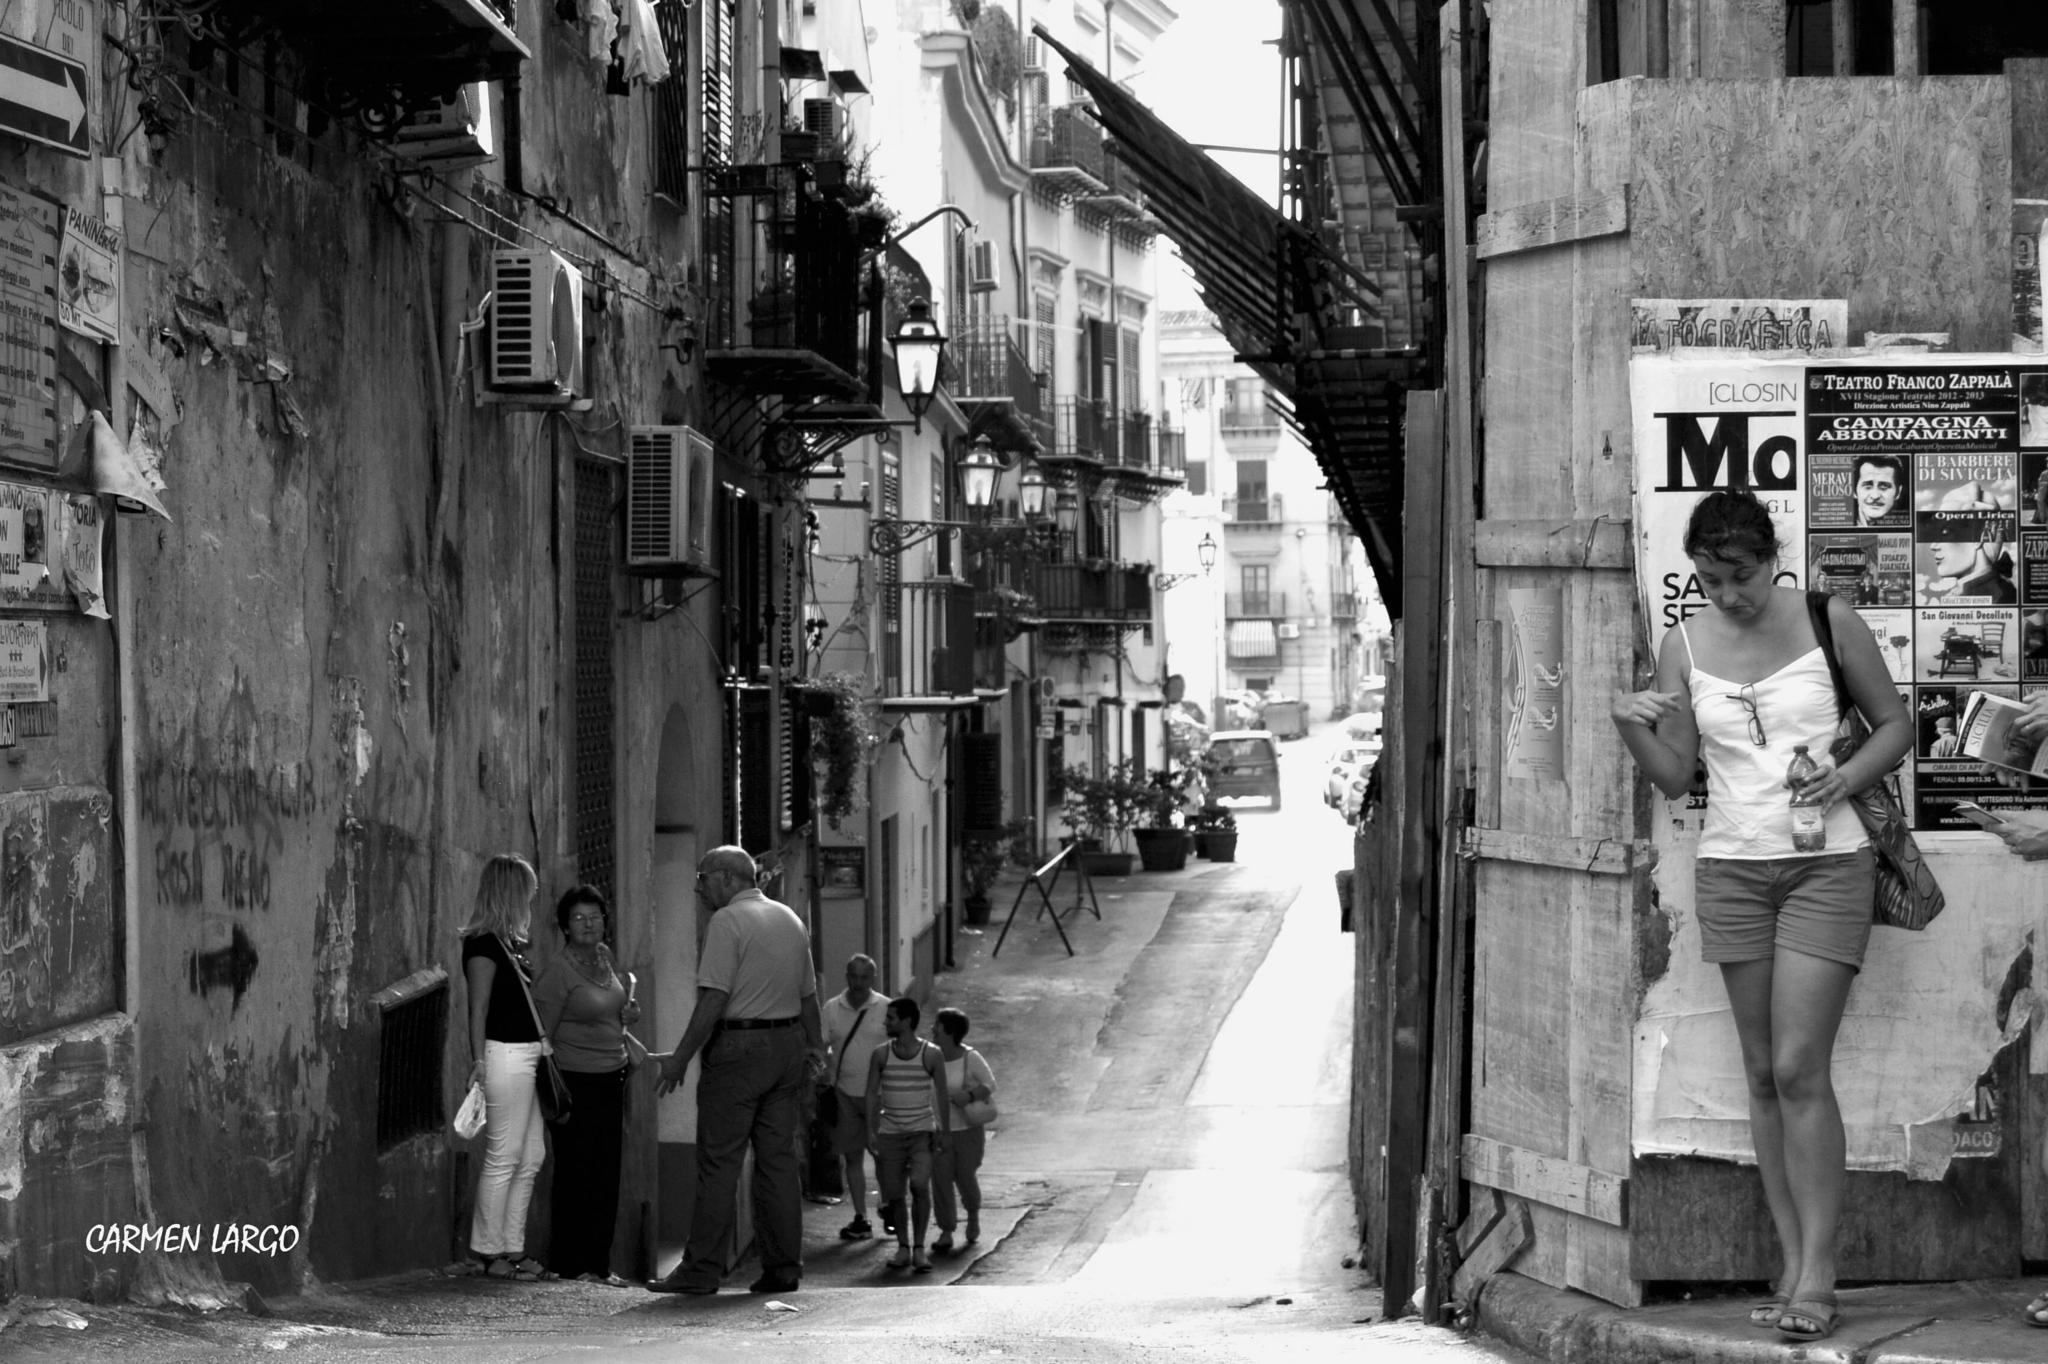 Turists in Palermo by carmenlargo13